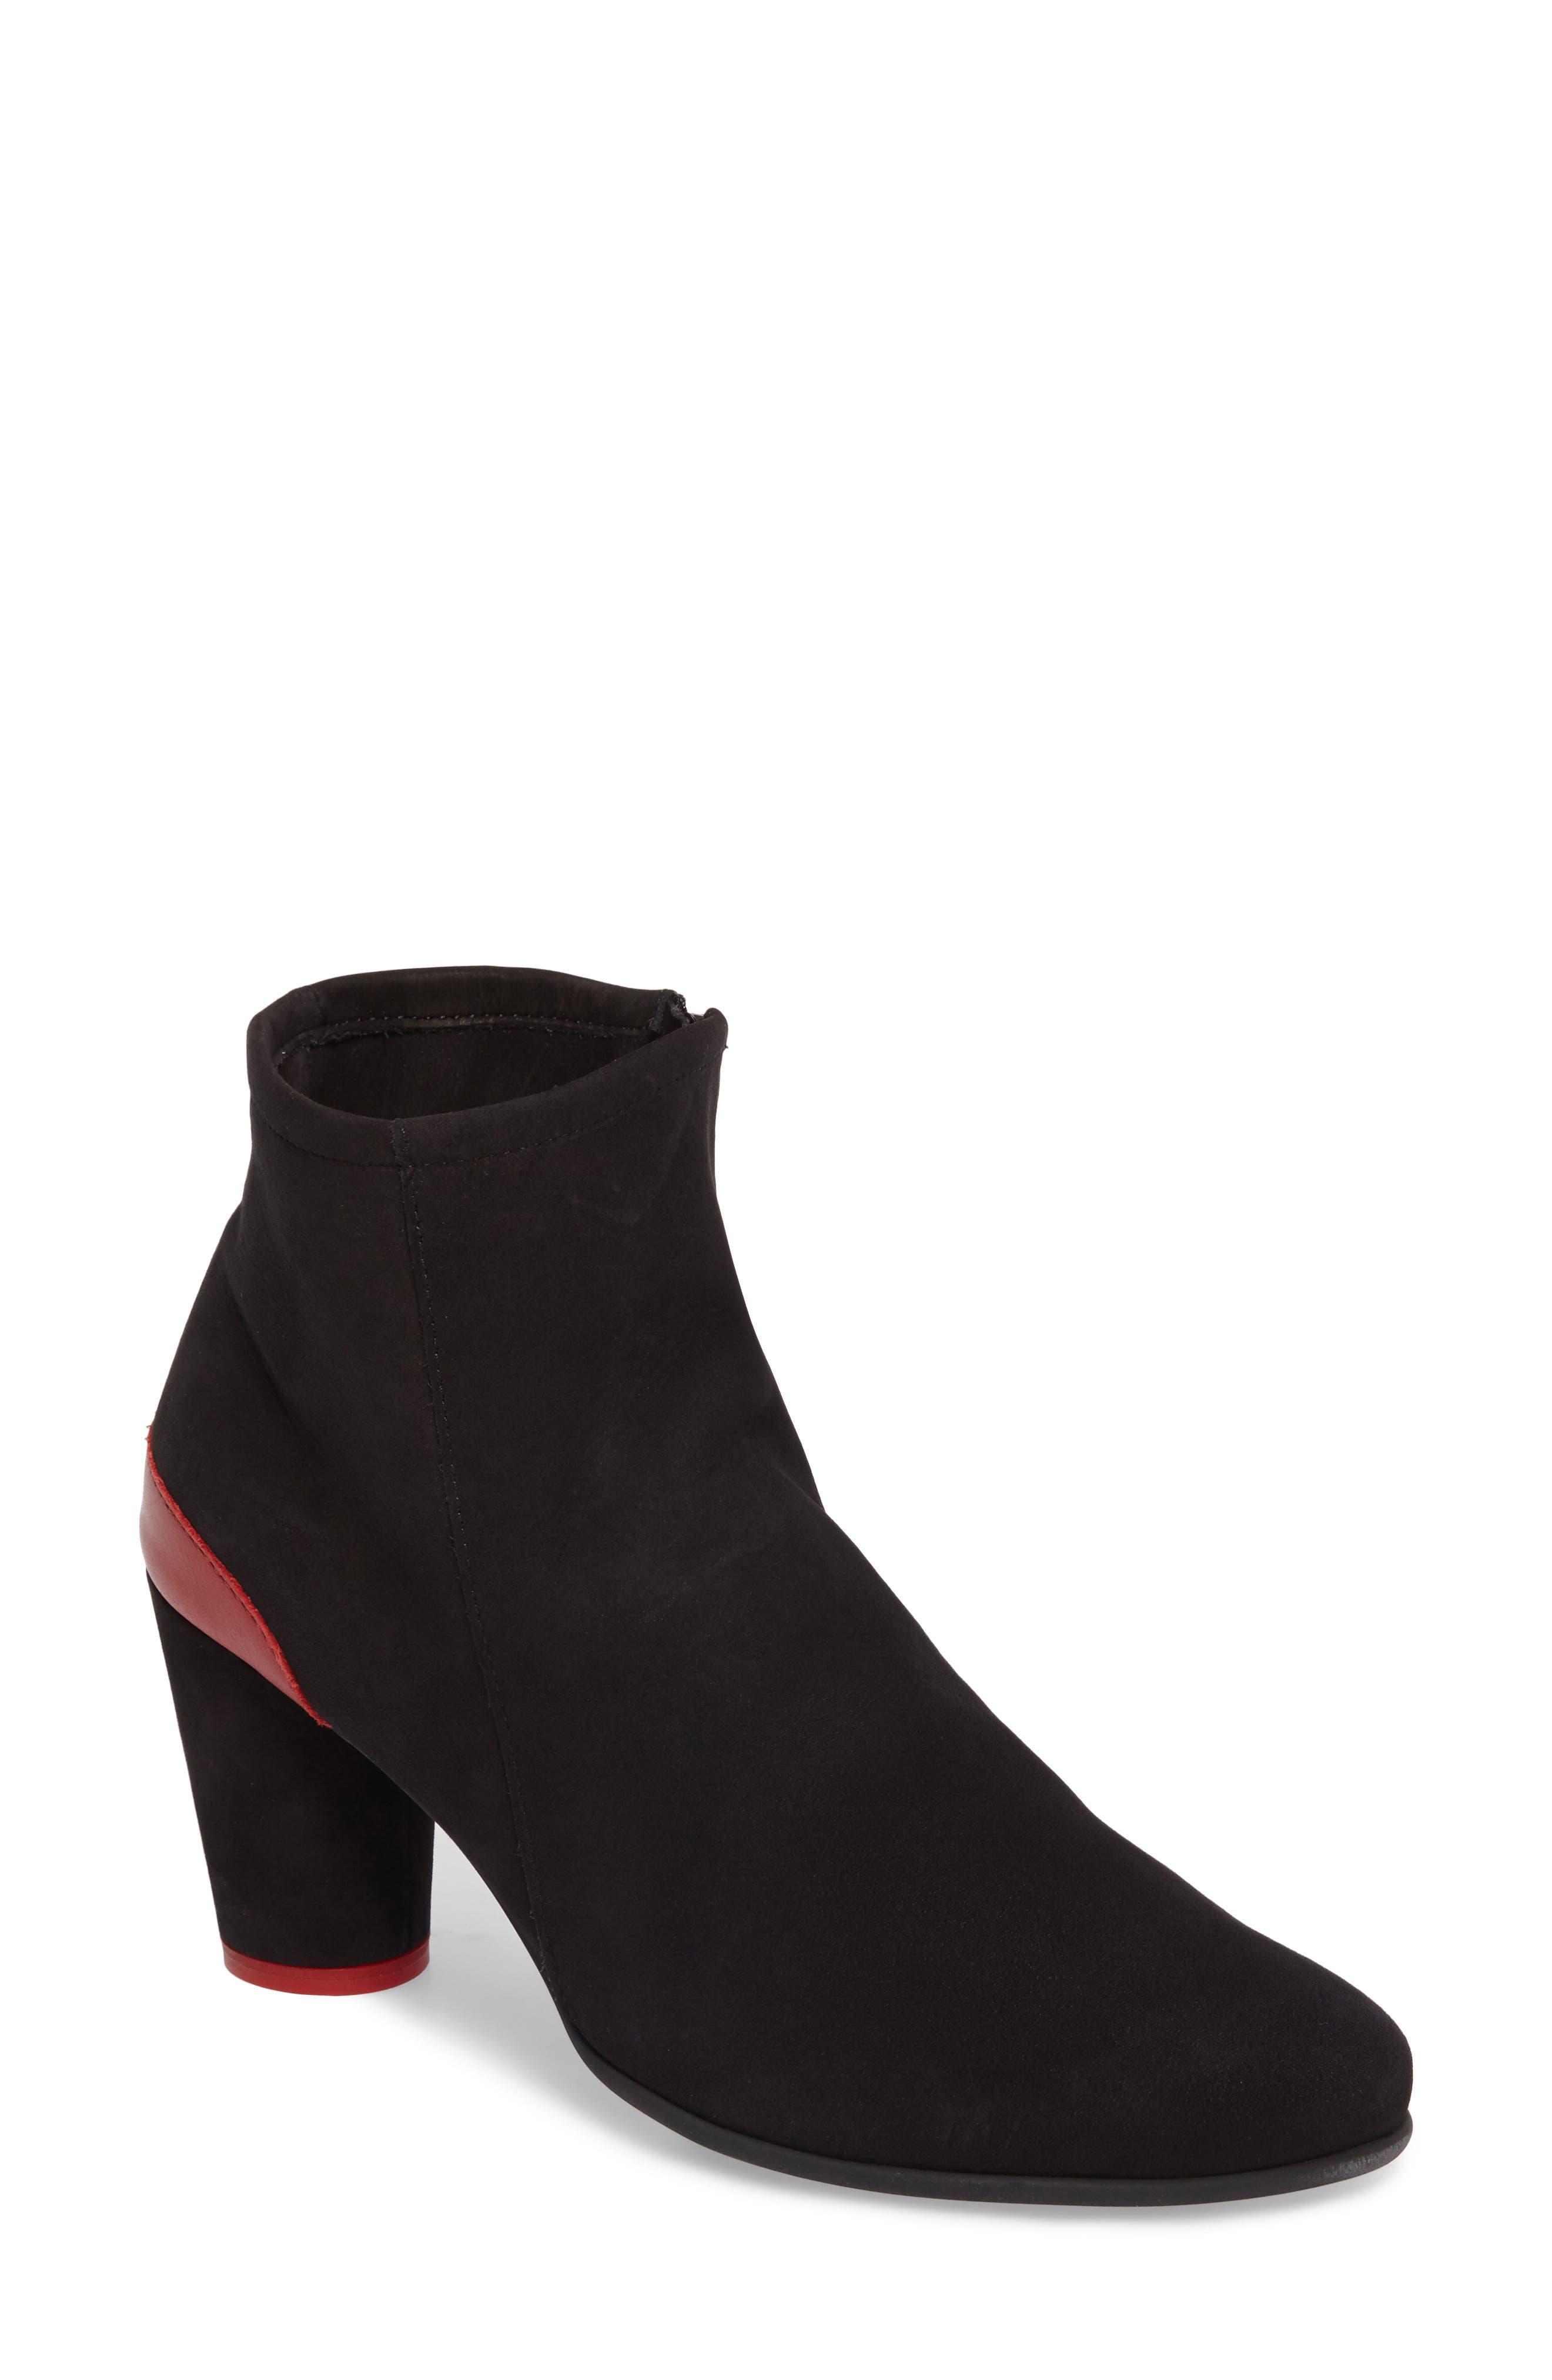 Klodea Bootie,                         Main,                         color, Noir/ Passion Nubuck Leather